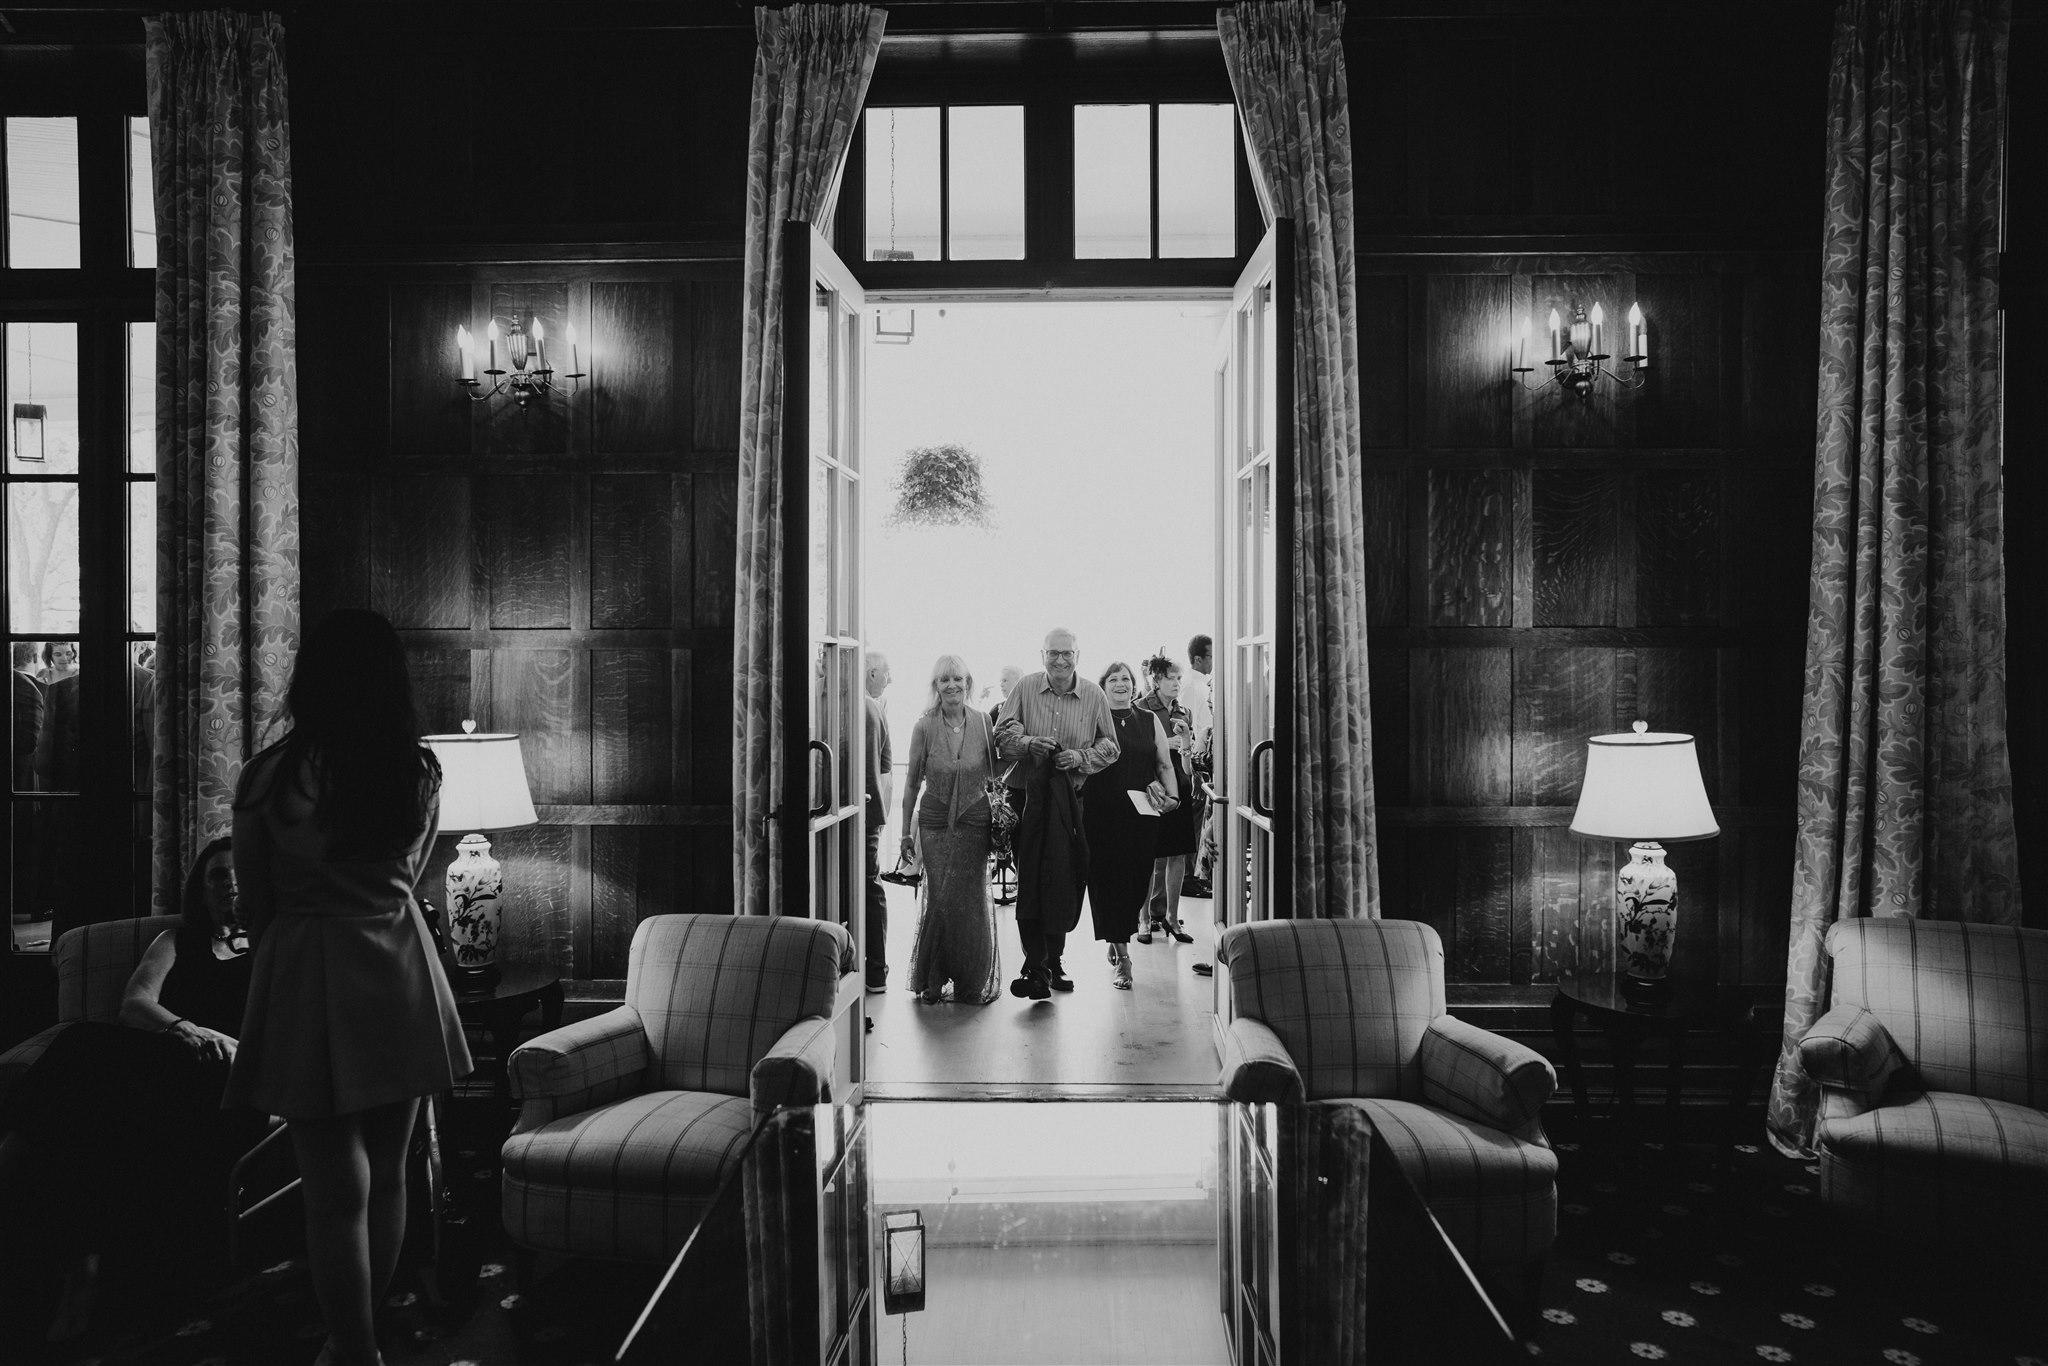 Chellise_Michael_Photography_Hudson_Valley_Wedding_Photographer_Otesaga_Hotel-4102.jpg